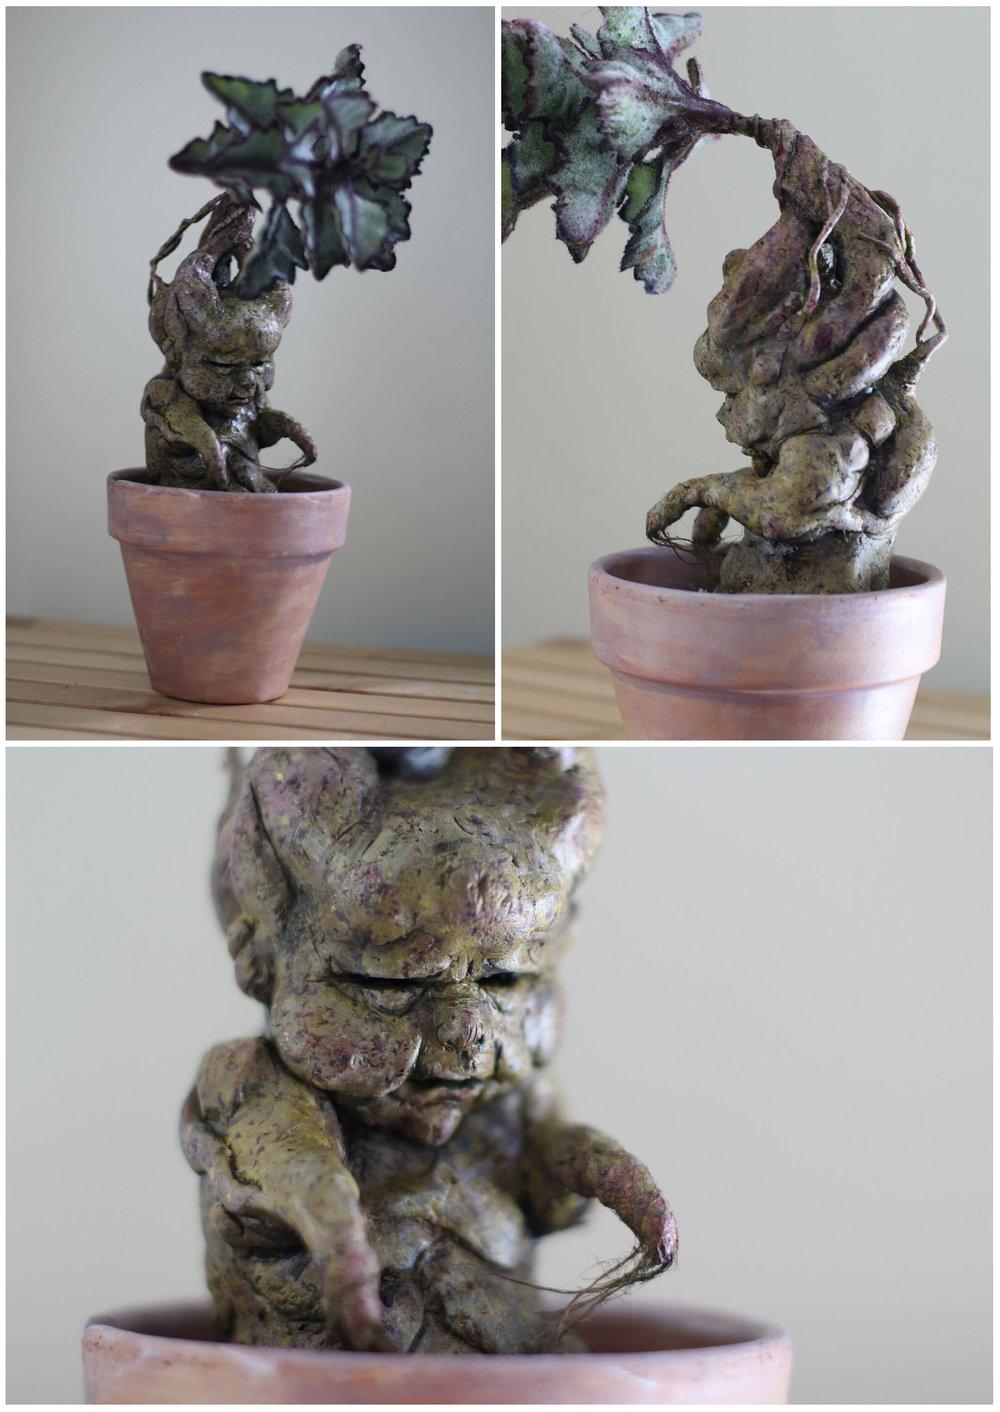 Mandrake by Anthony Lombardo